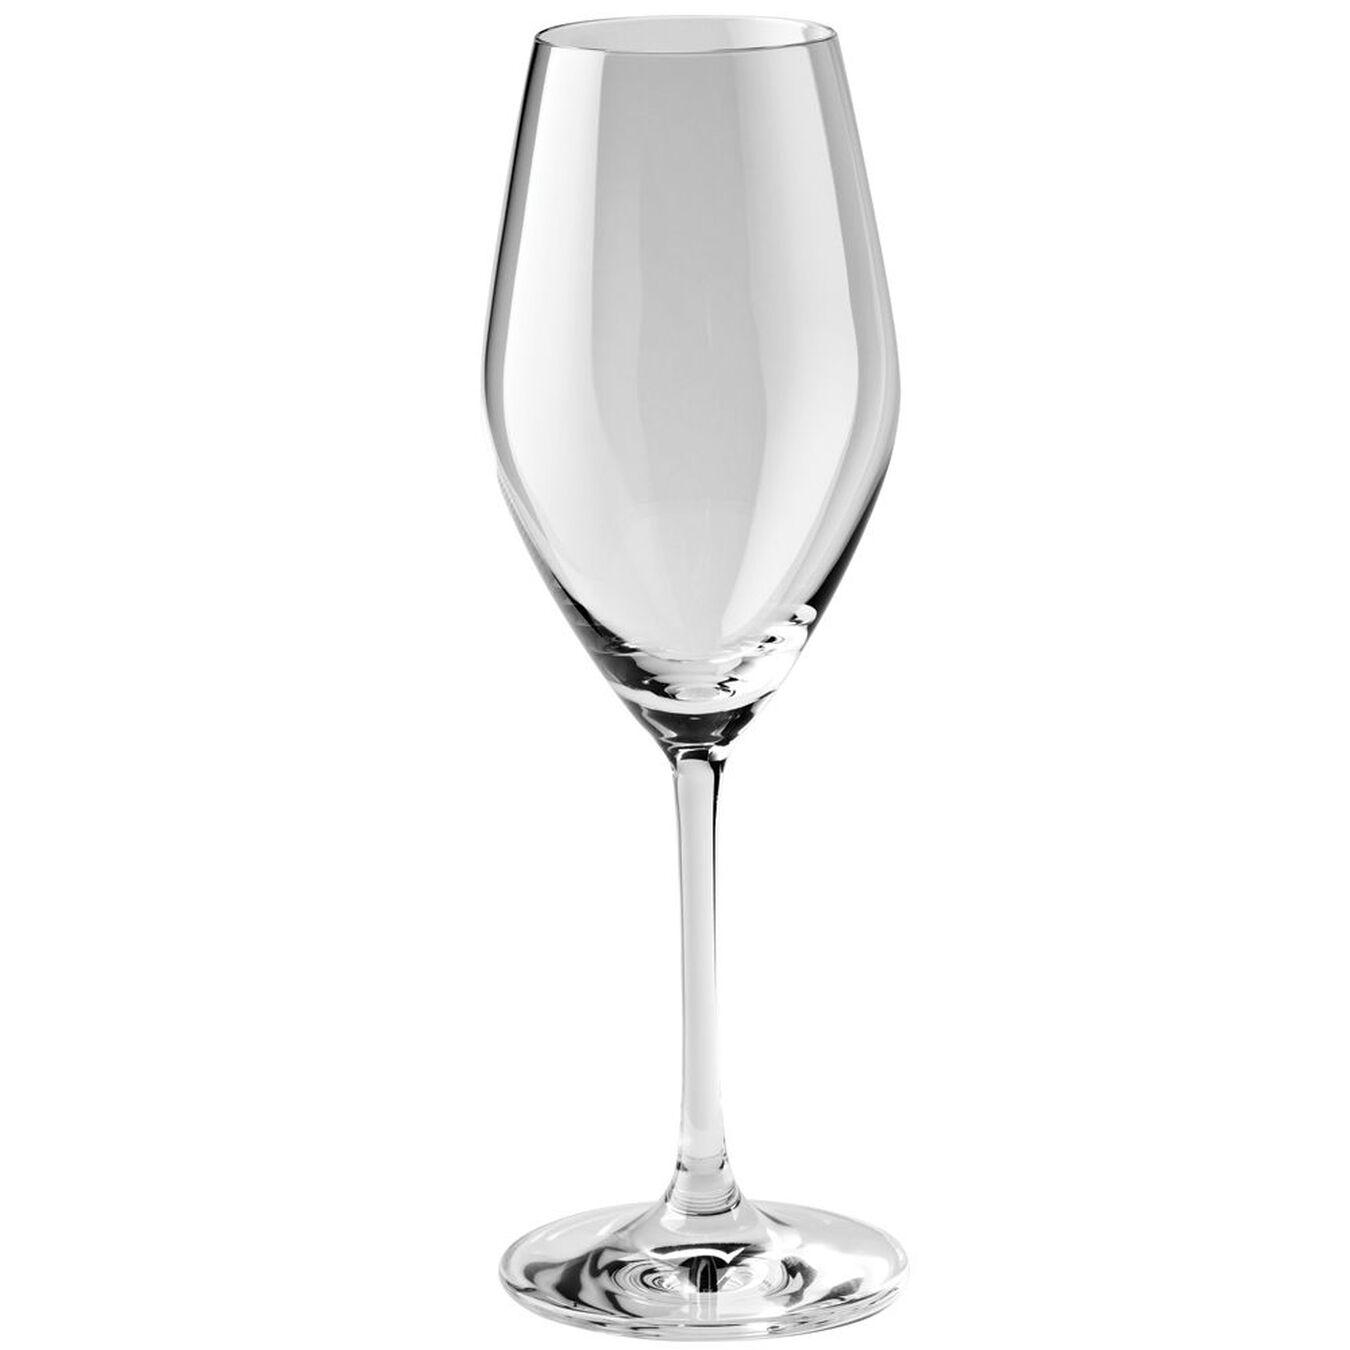 6-pc Champagne Flute Set,,large 1